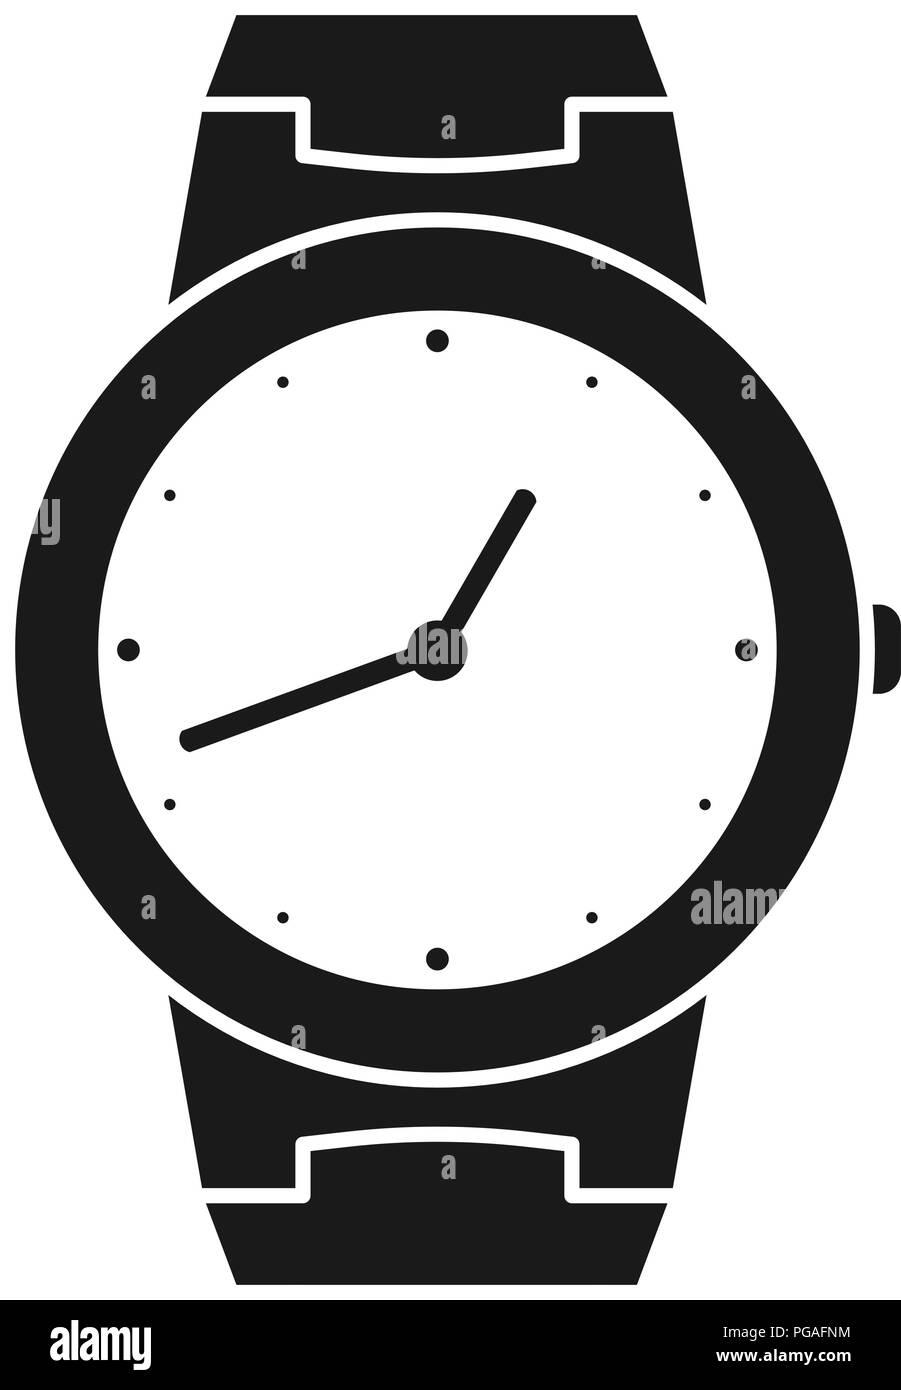 Icon of wrist watch. Symbol of hand clock. Illustration of timepiece, chronometer - Stock Image